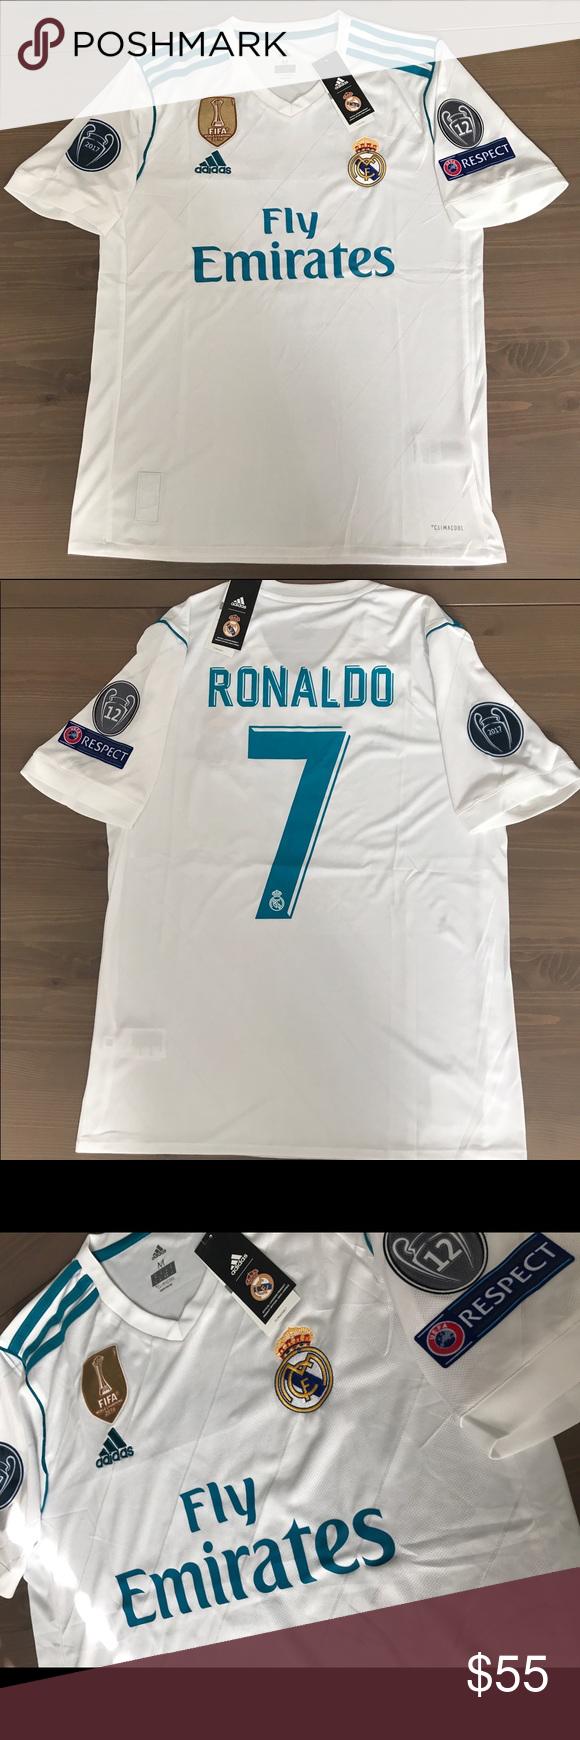 e1cbc57fe Real Madrid 17 18 Ronaldo  7 adidas Jersey Real Madrid 17 18 Home white  Ronaldo  7 men adidas soccer jersey Champions league Gold fifa patch adidas  Shirts ...